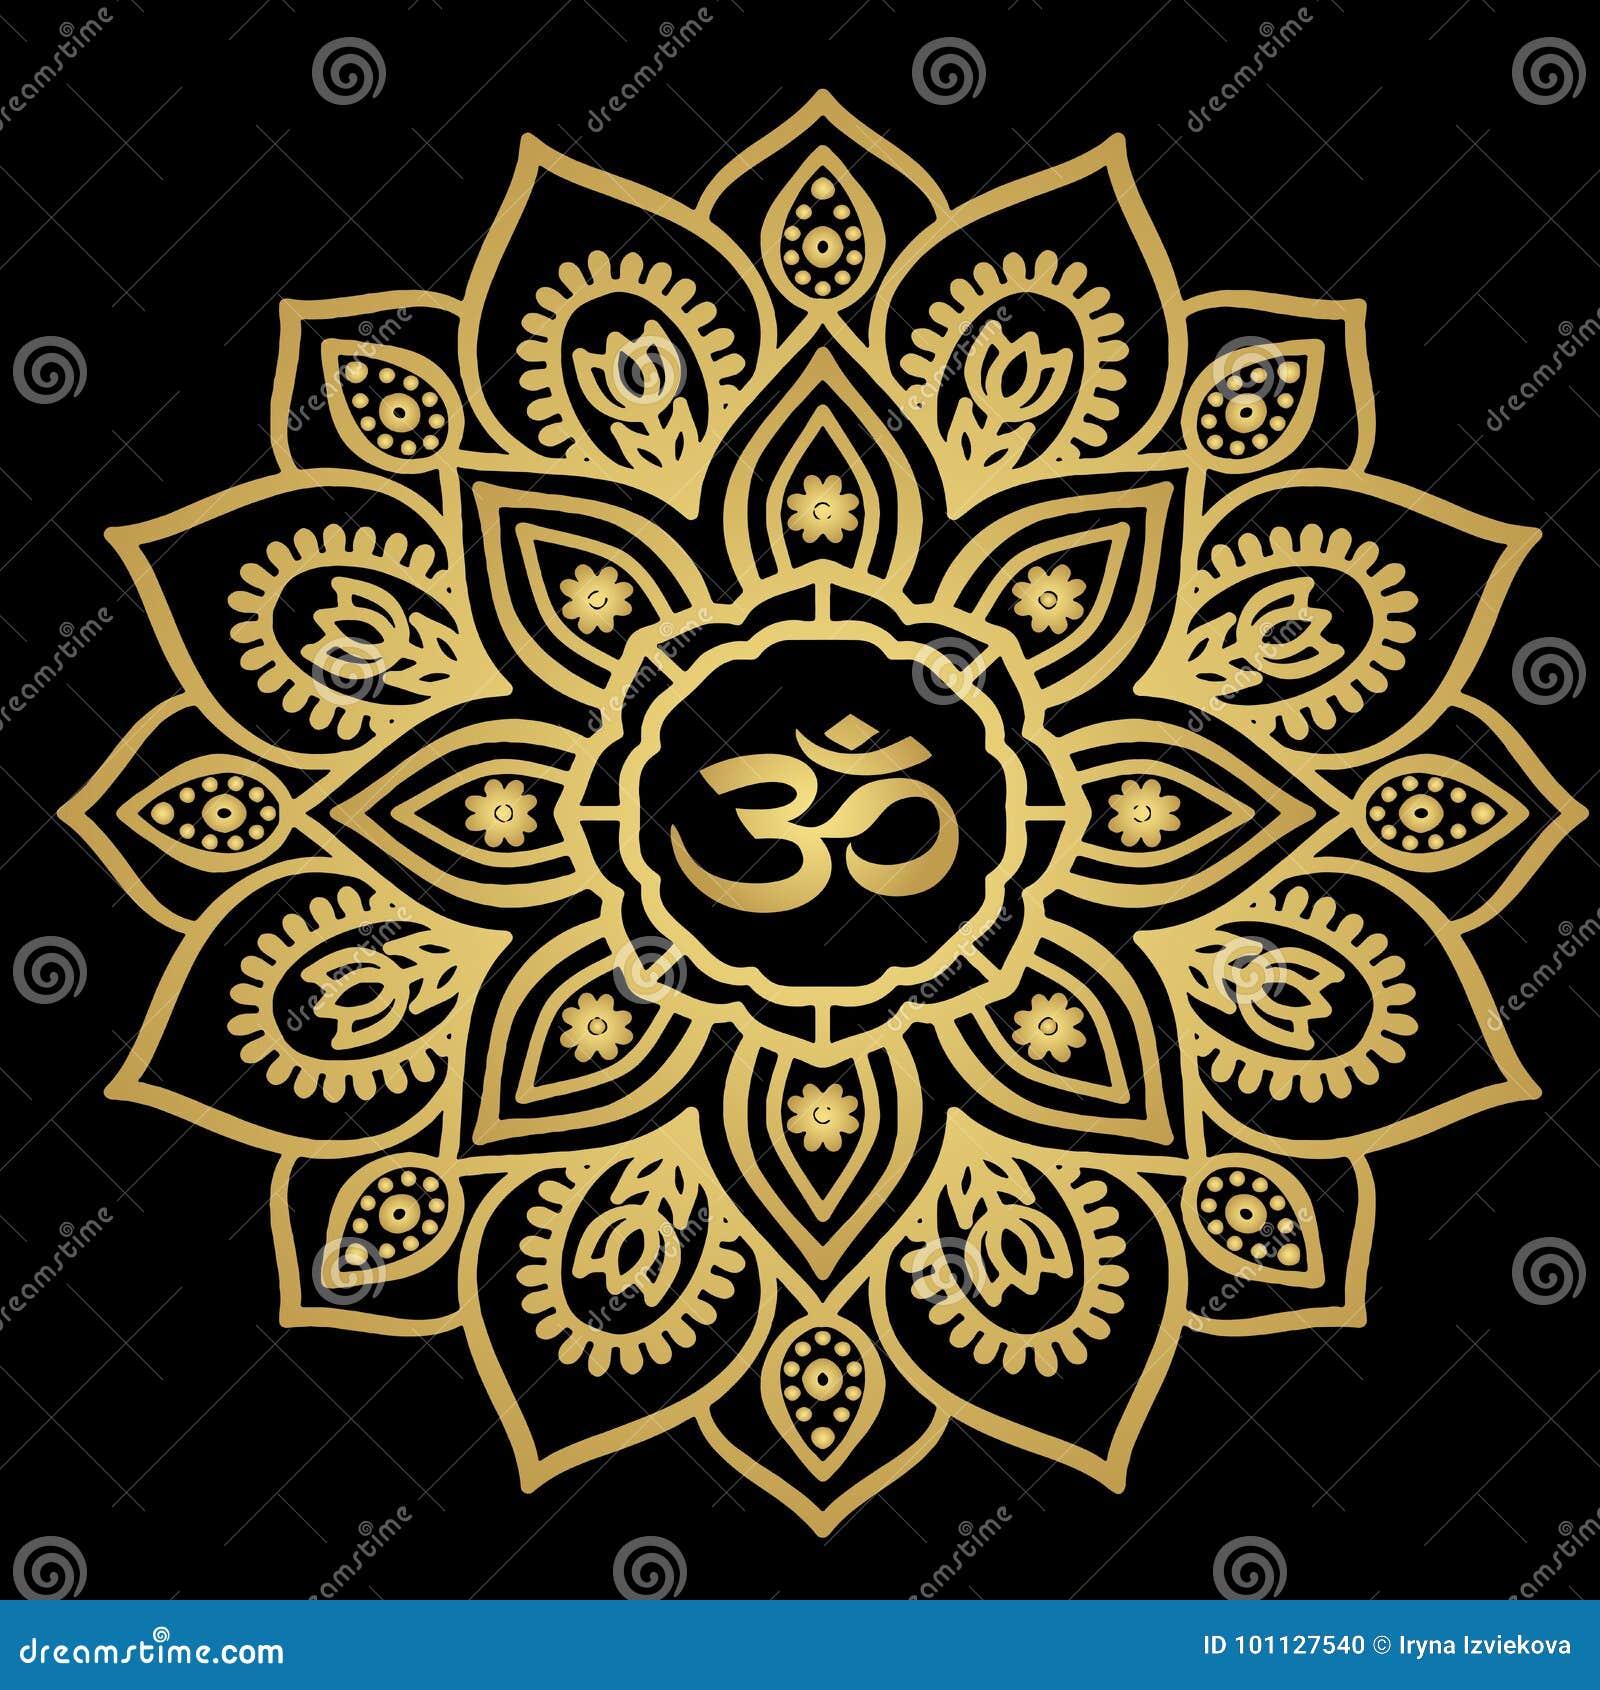 f8c198ded Beautiful Golden Mandala Tattoo Sketch Stock Vector - Illustration ...